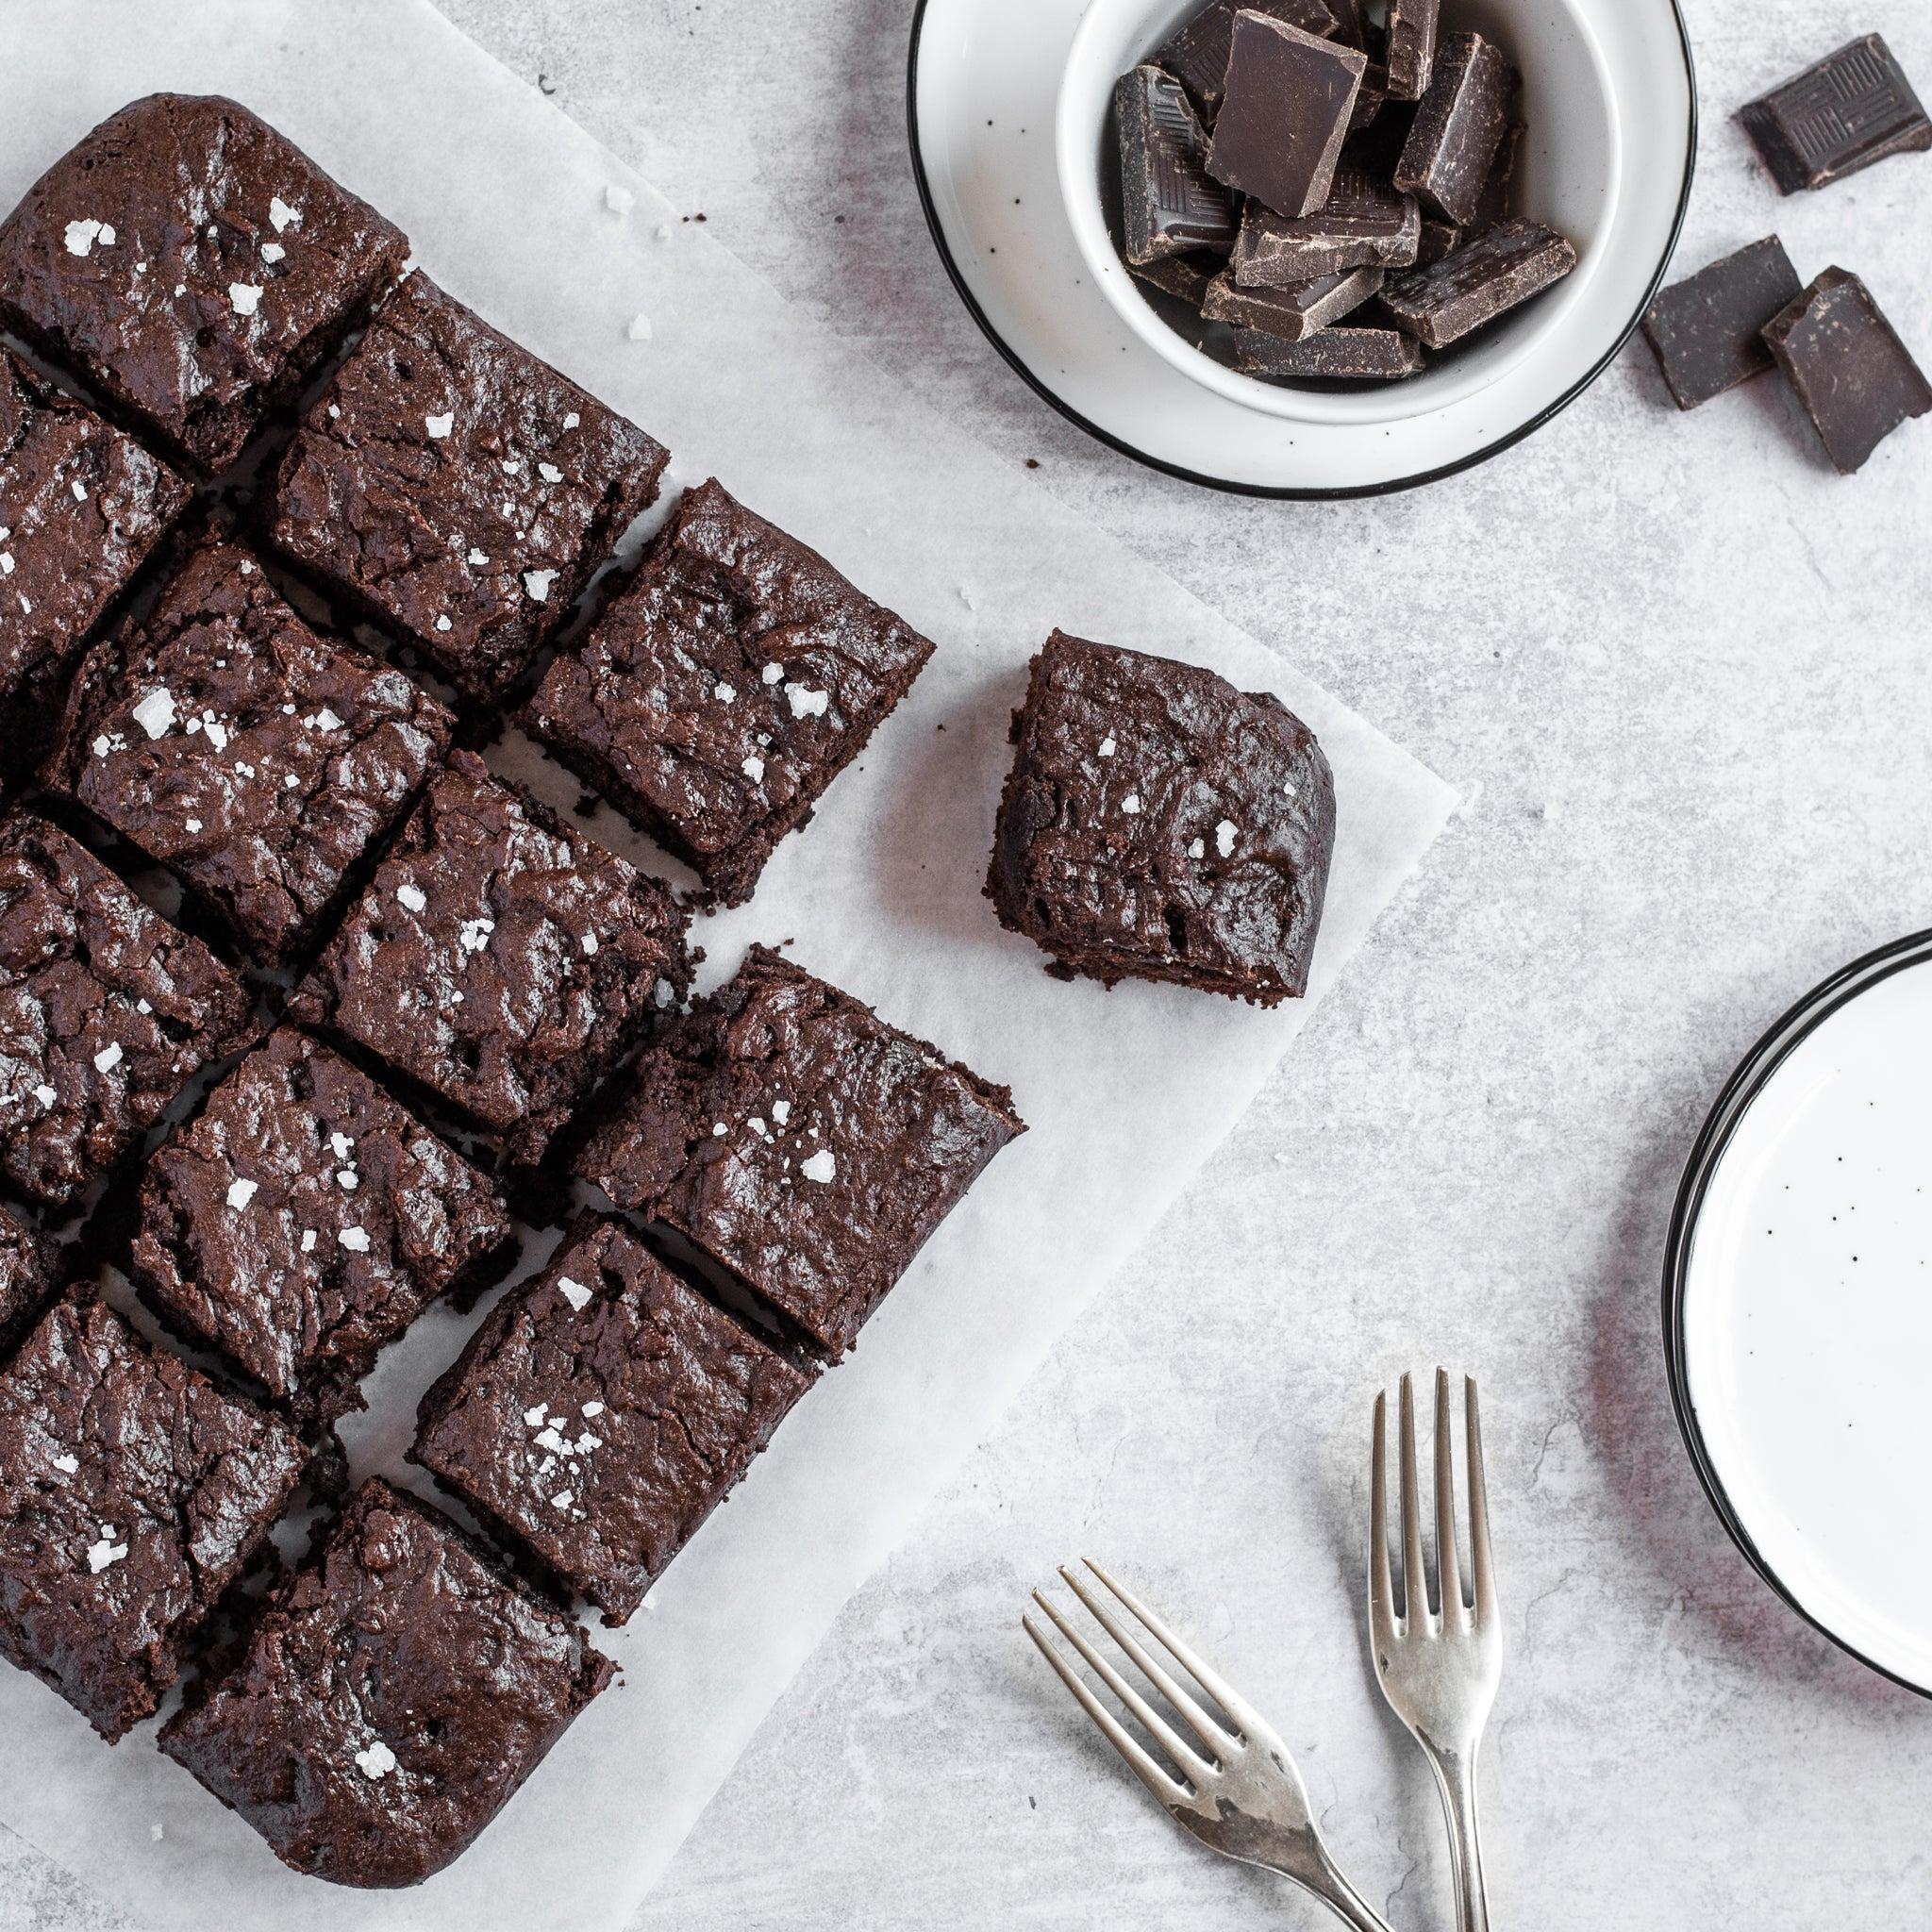 Gluten-Free-Vegan-Brownies-SQUARE-2.jpg